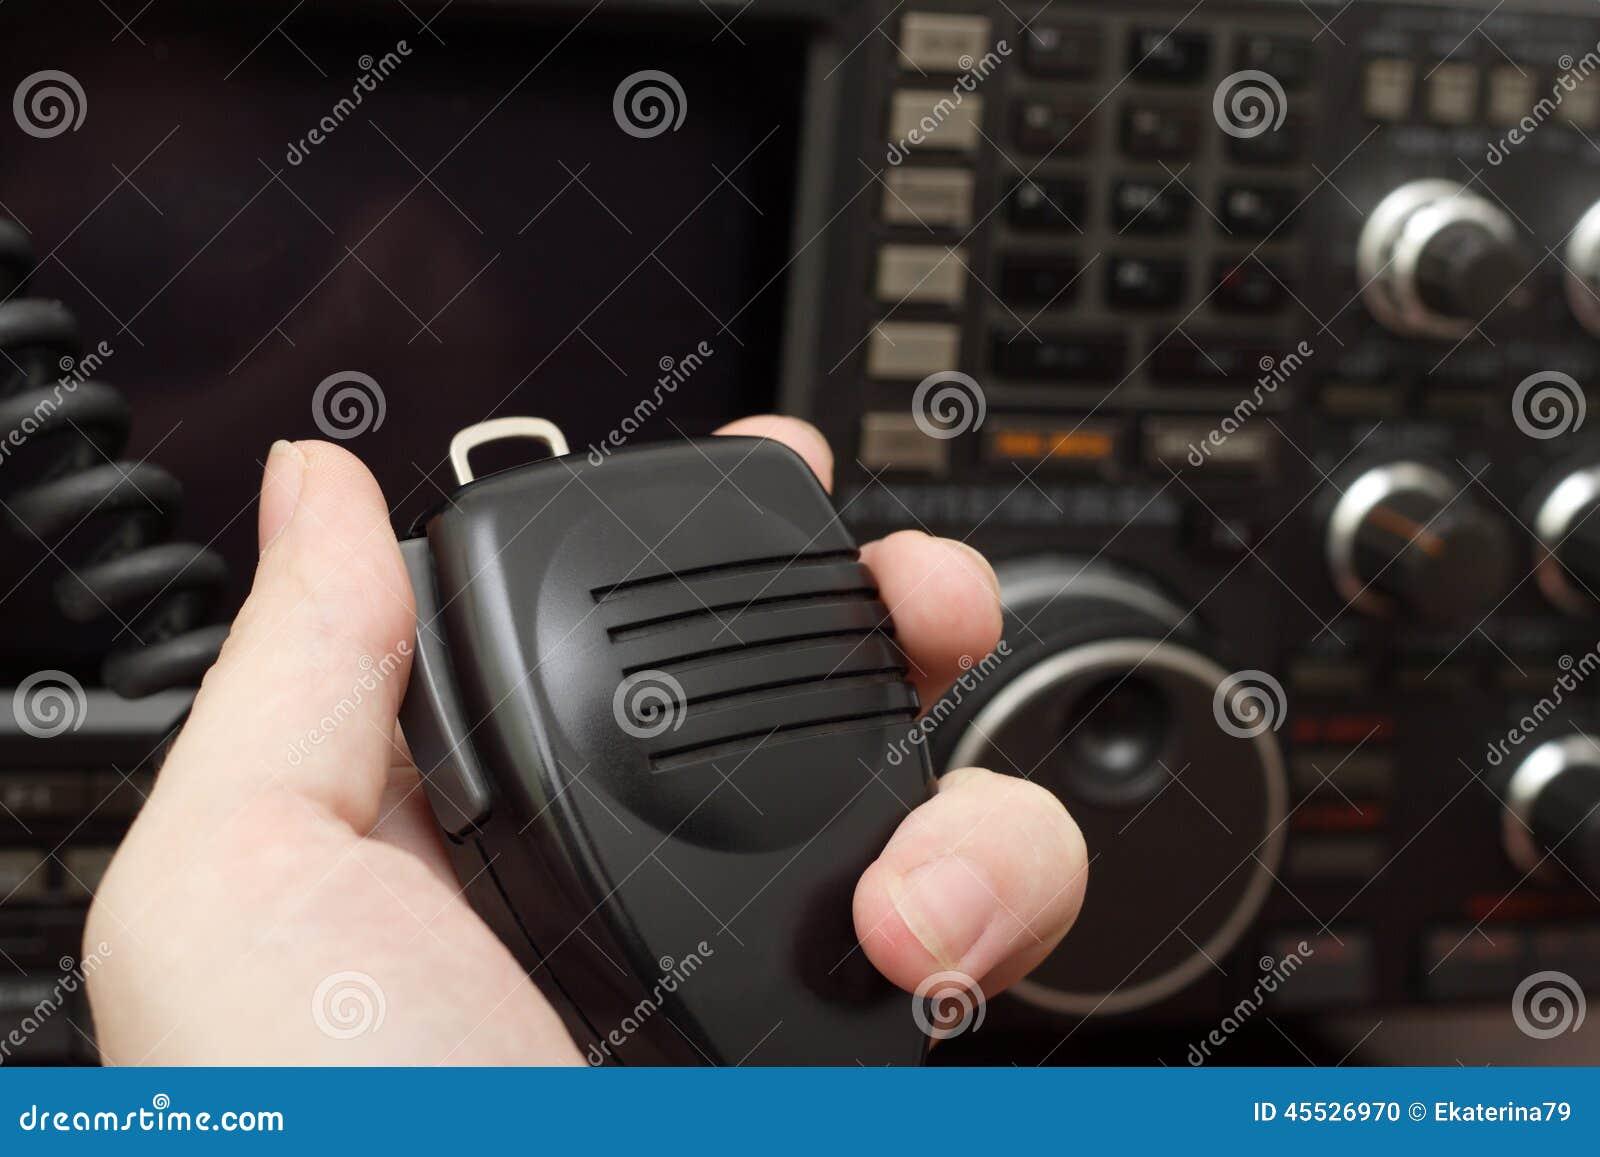 Amateur Radio Gear